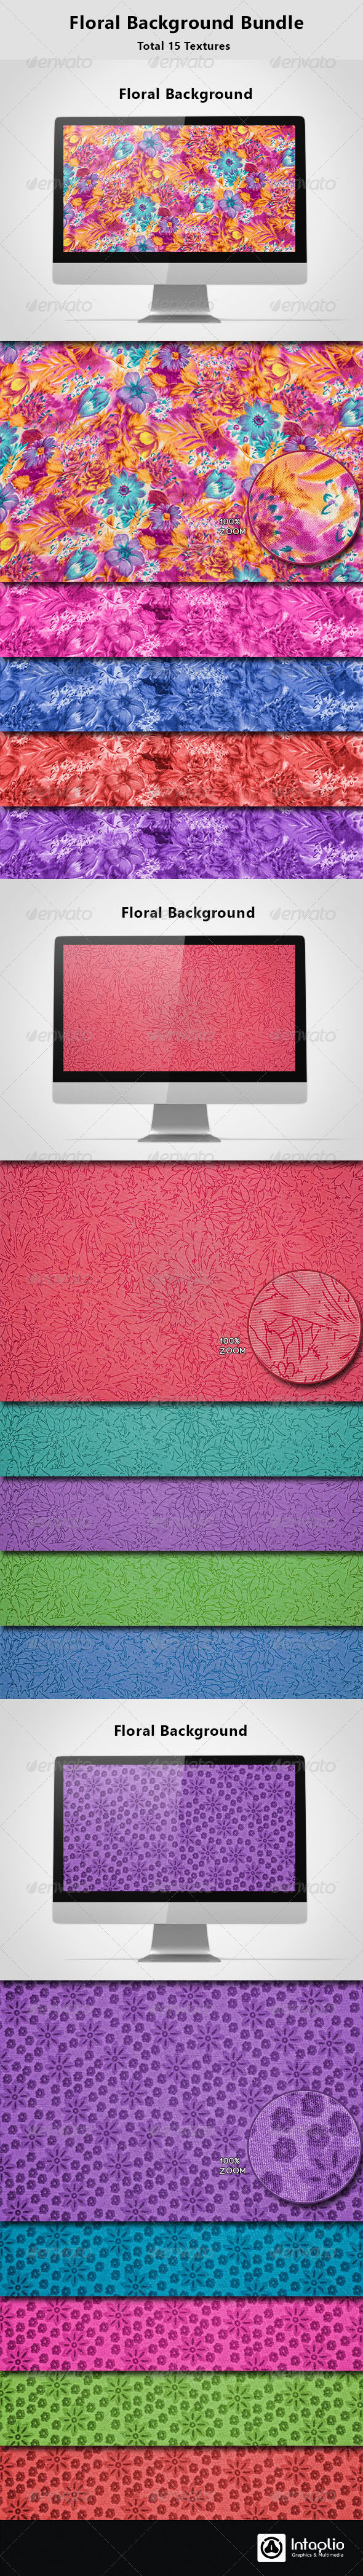 Floral Background Bundle - Backgrounds Graphics